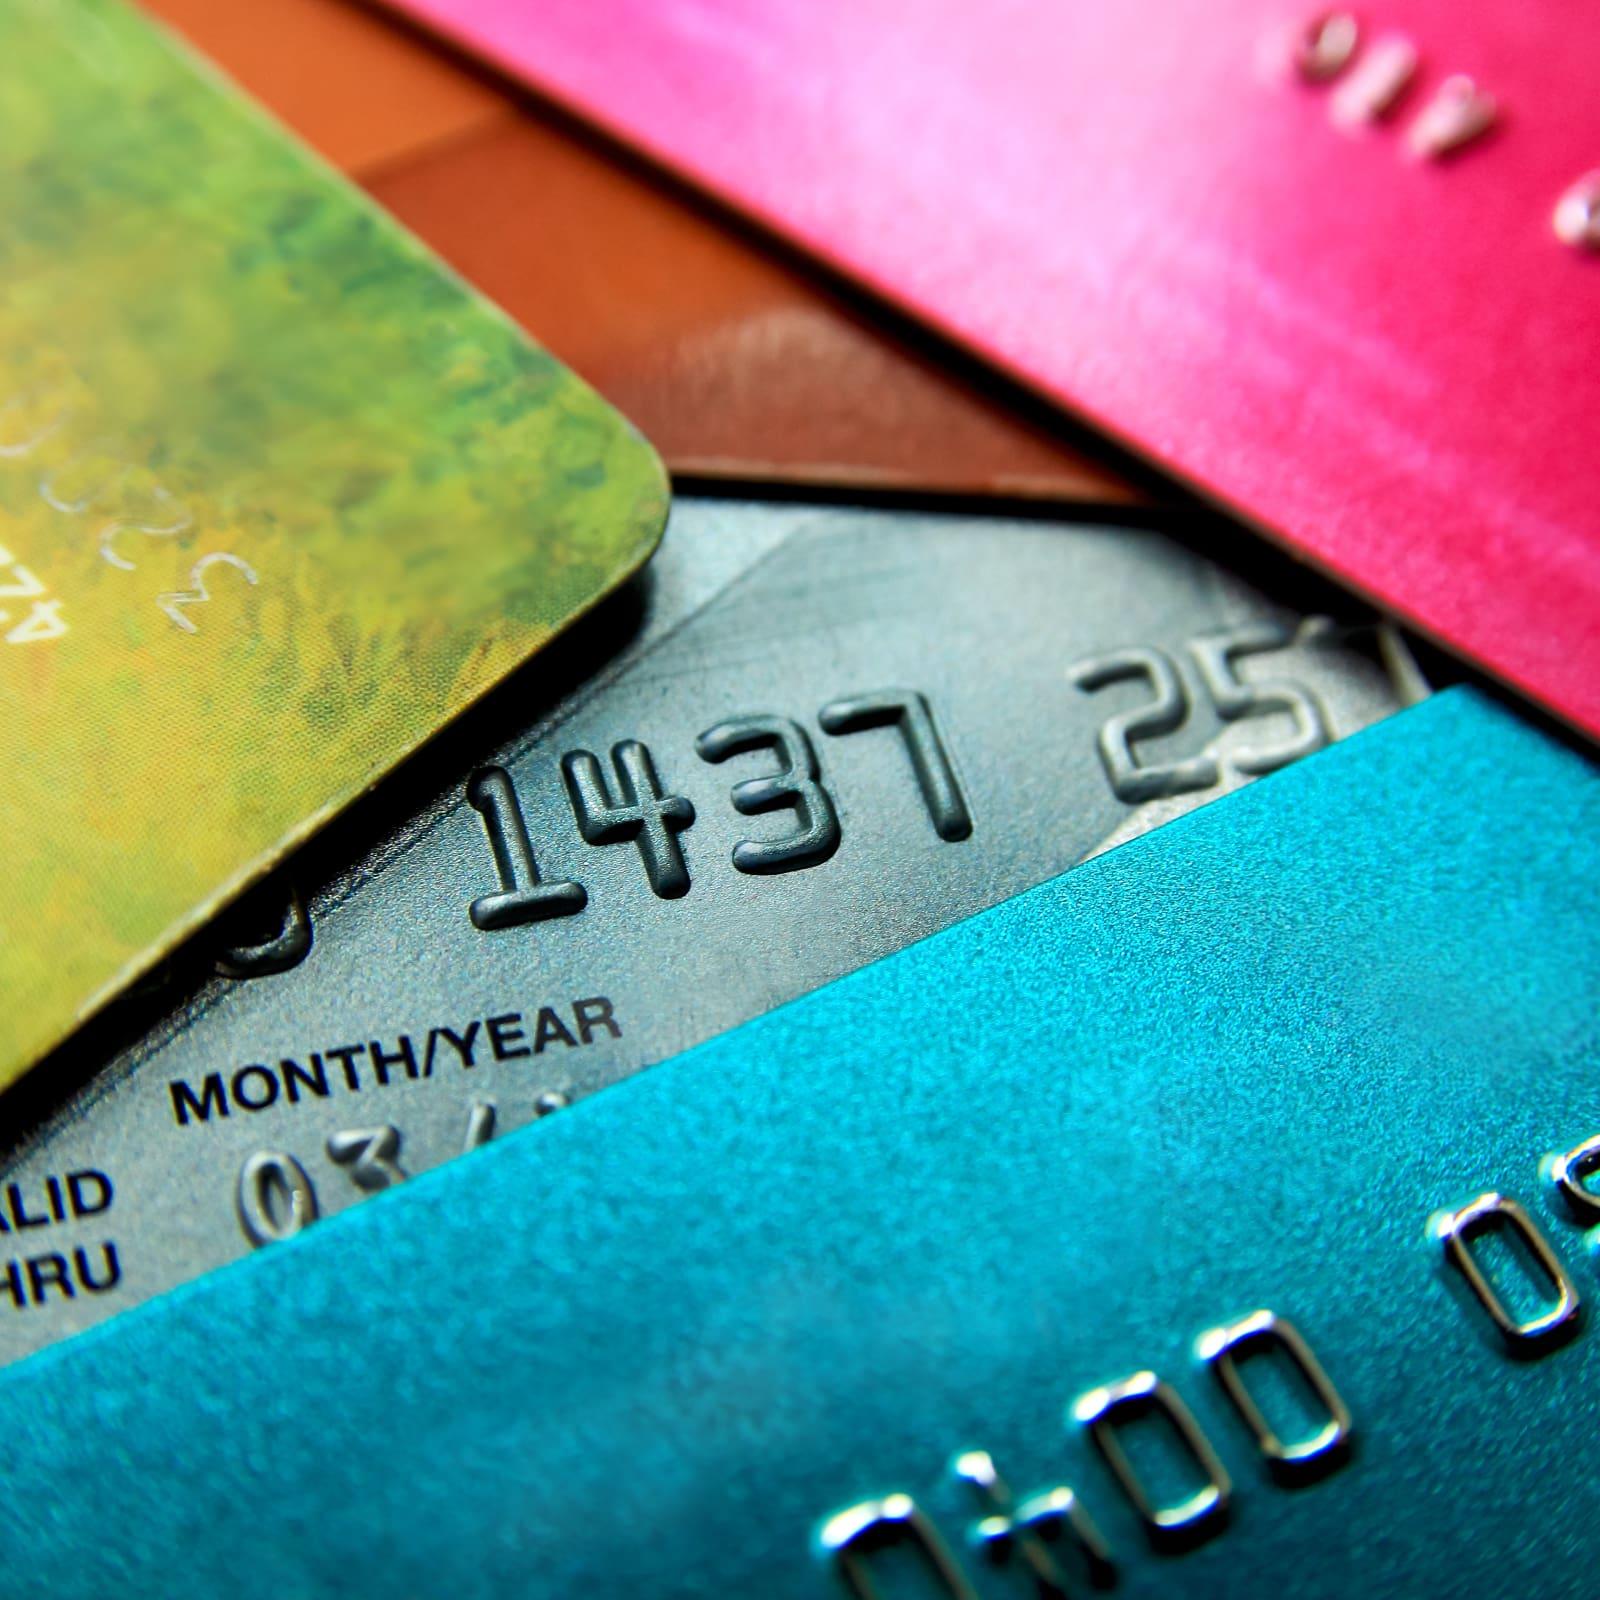 быстробанк кредитная карта онлайн заявка без отказа